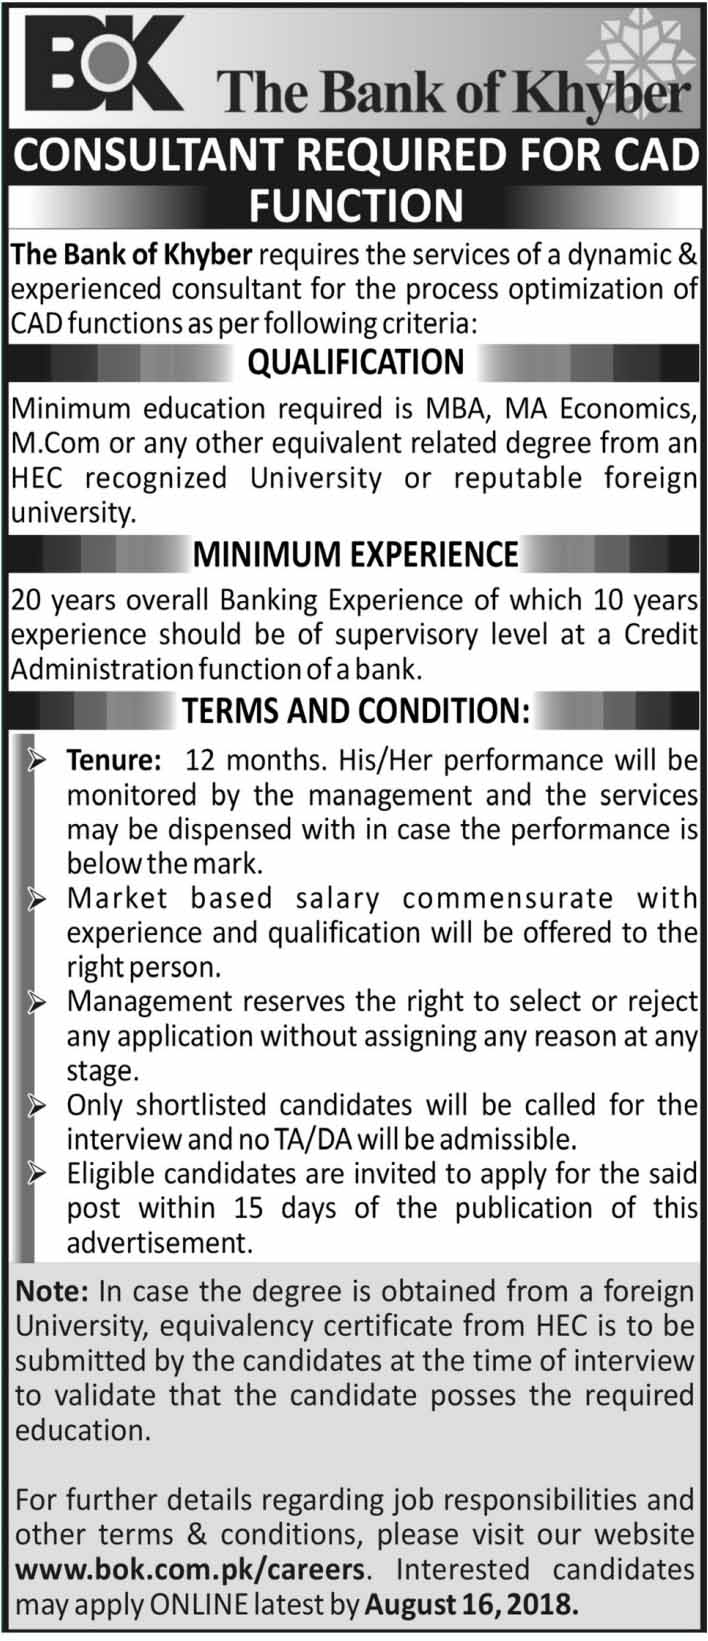 BOK the Bank of Khyber Latest Jobs 2018 Apply online-thumbnail